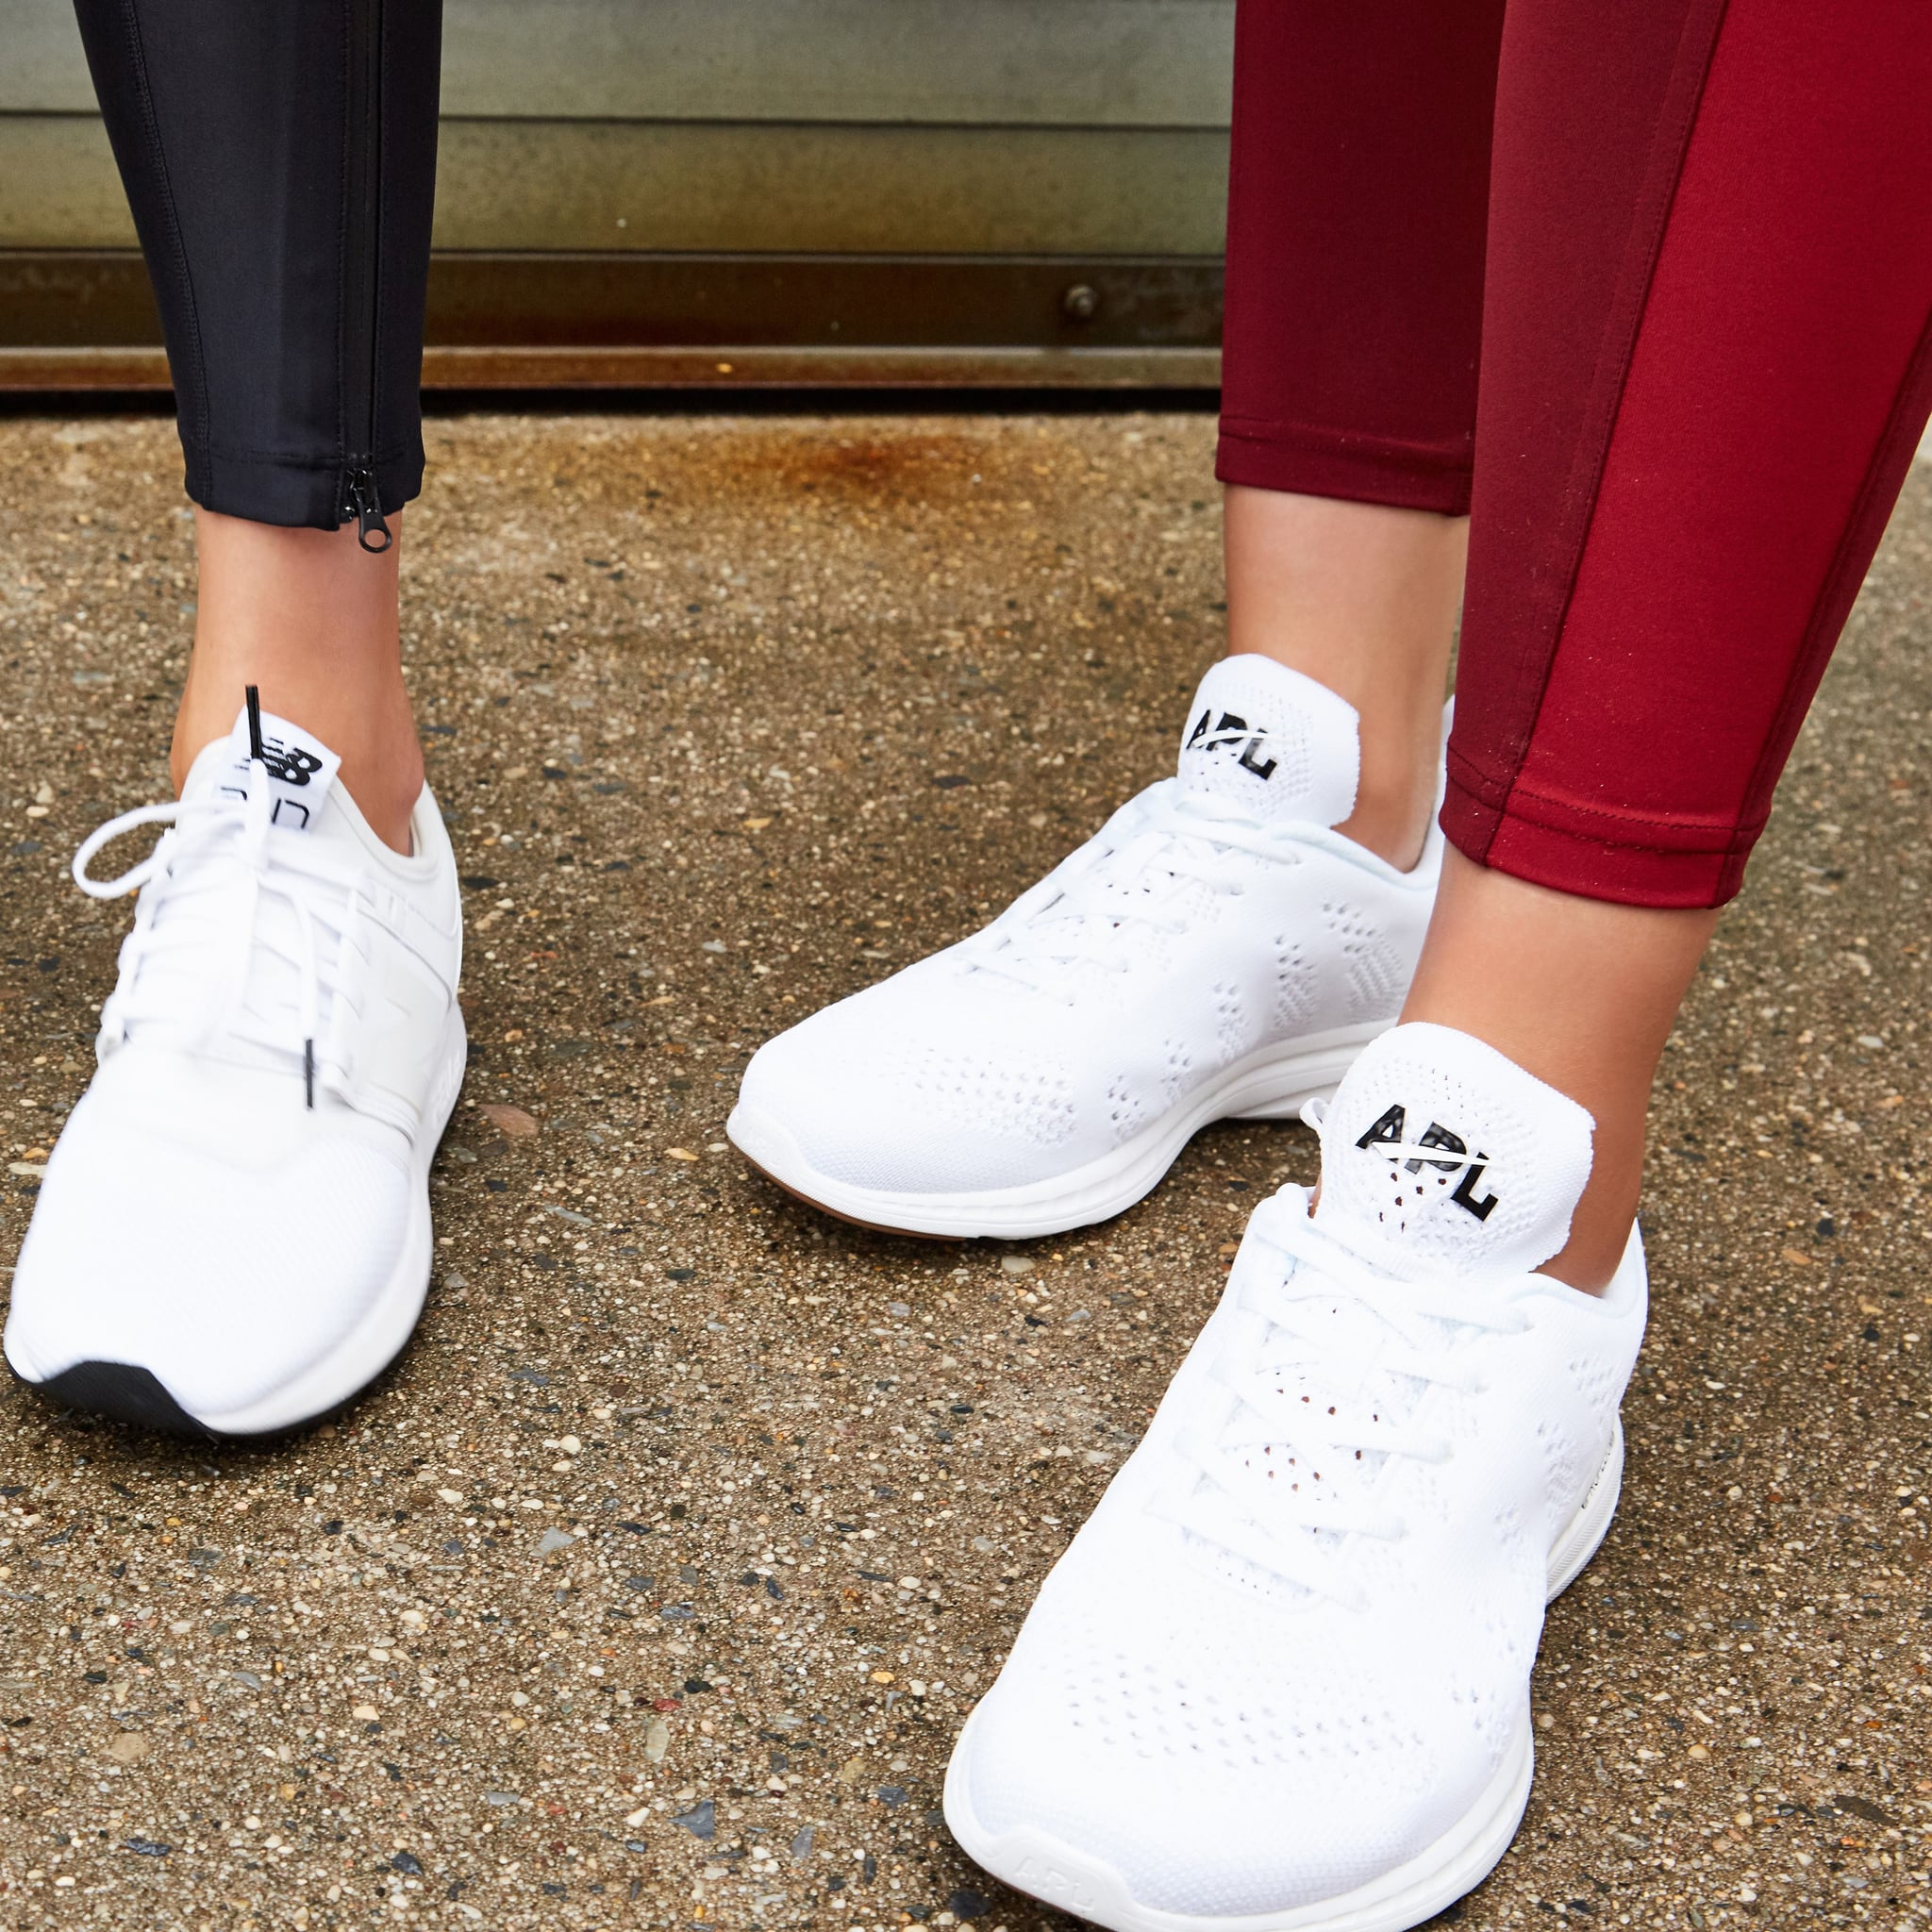 best asics women's running shoes 2019 navy